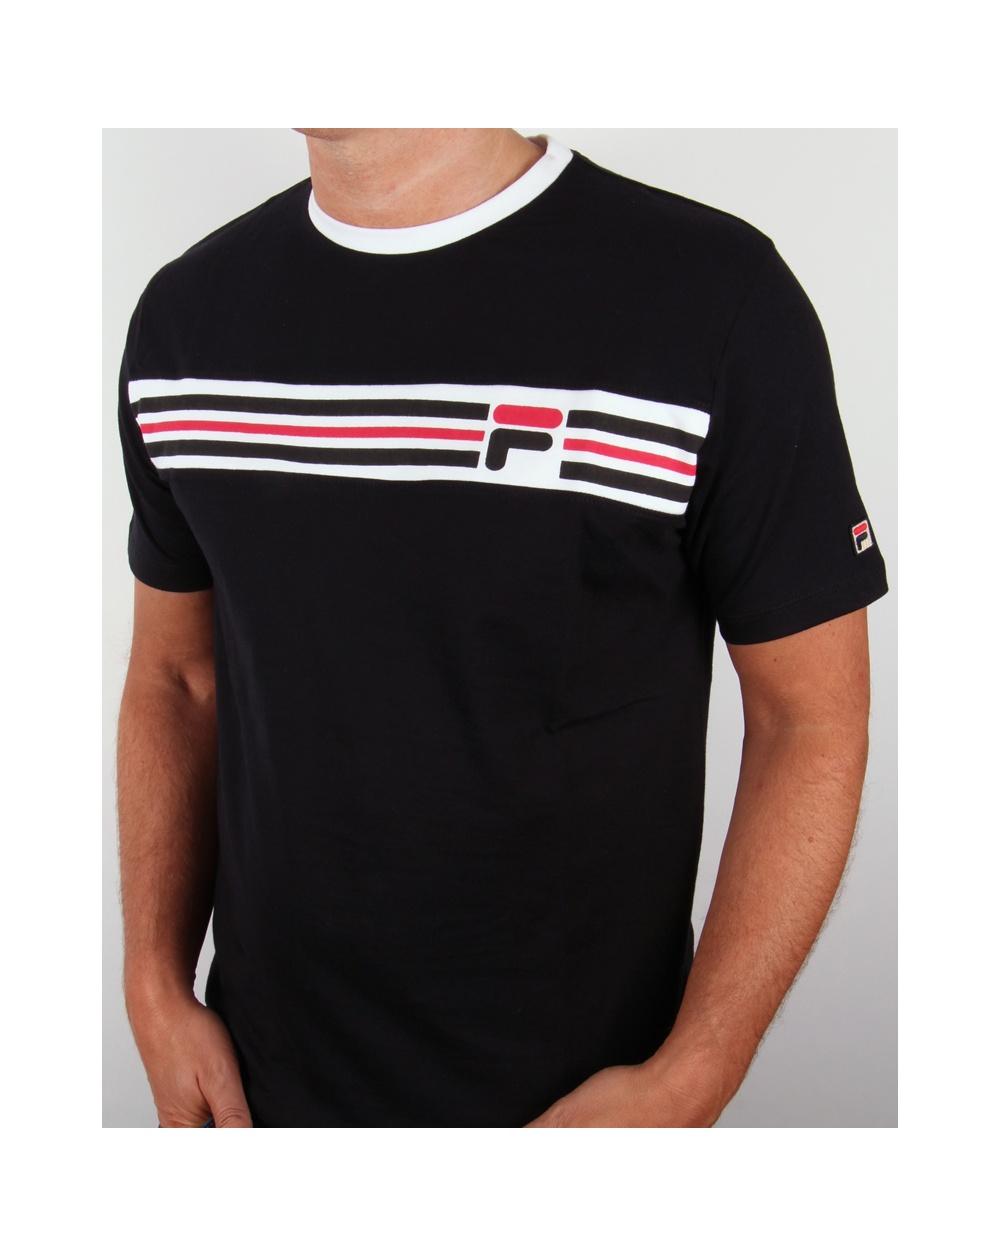 fila vintage headband stripe t shirt black fila vandorno stripe t shirt. Black Bedroom Furniture Sets. Home Design Ideas